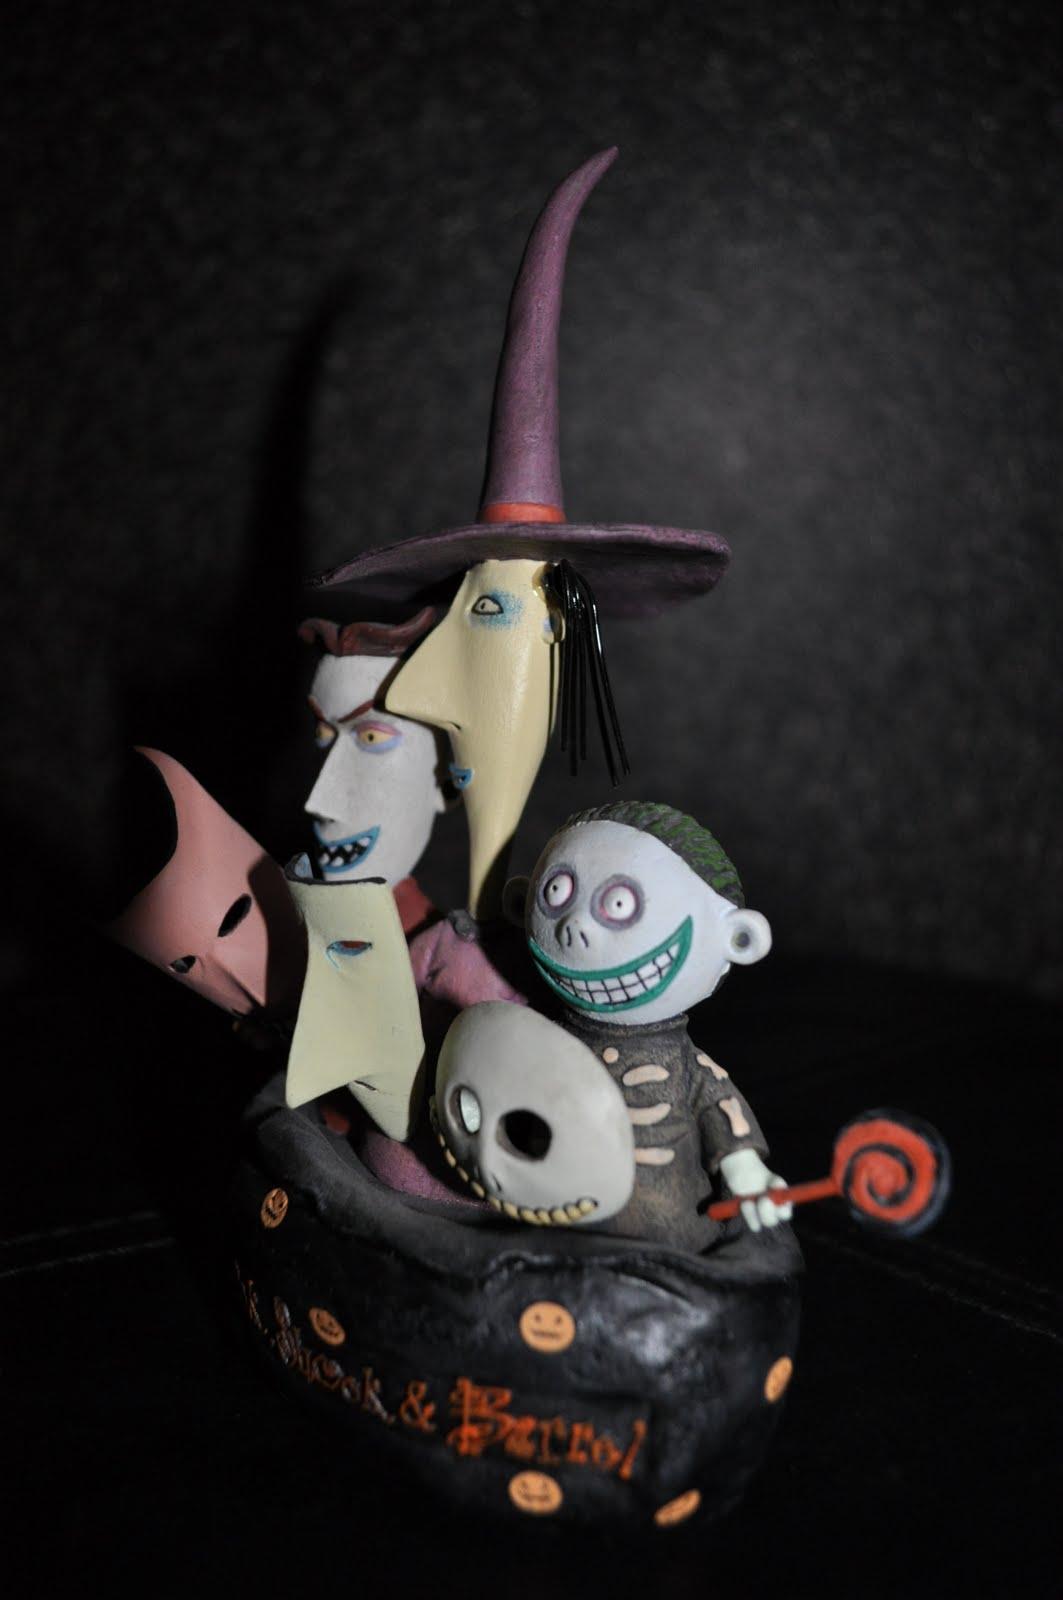 disney pixar fanatics nightmare before christmas neca busts